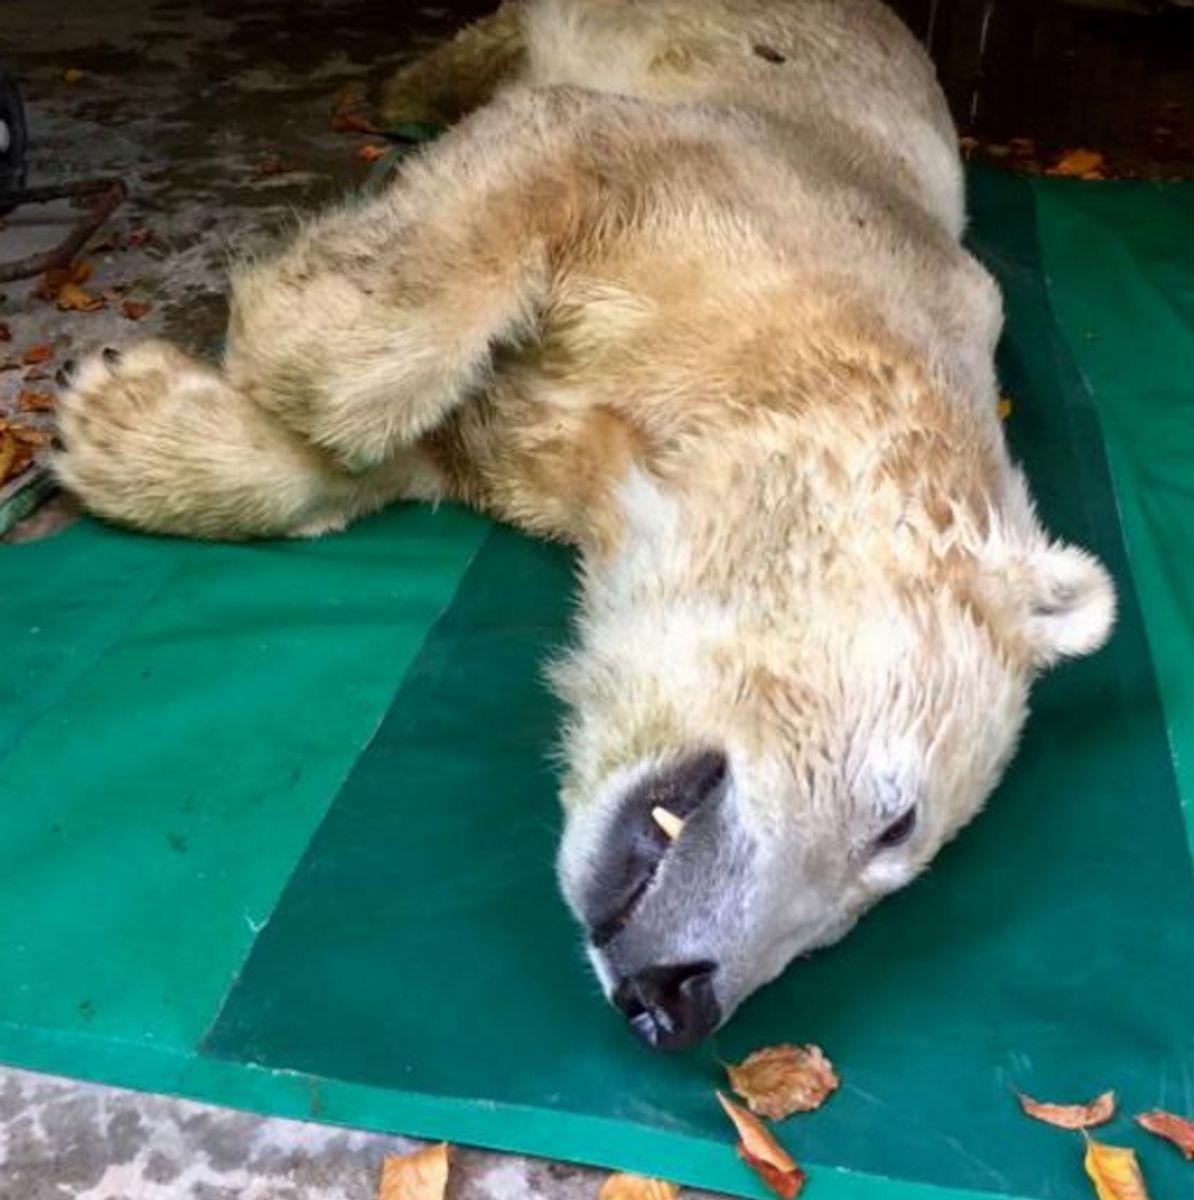 Isbjørnen Isbjørnen Vilma er død efter blot to uger i Aalborg Zoo. Foto: Aalborg Zoo.